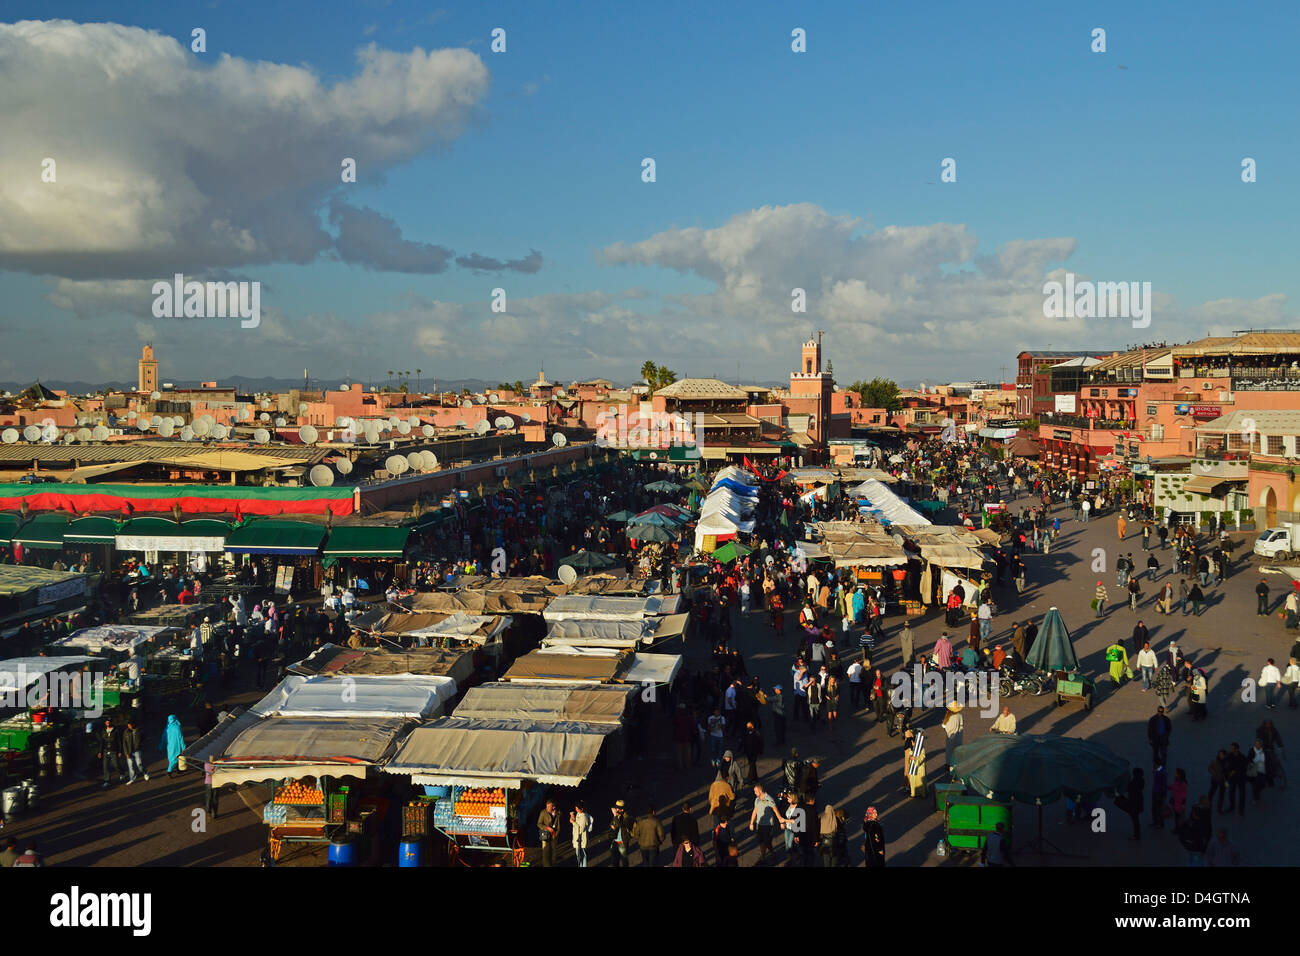 Jemaa El Fna, Medina, Marrakesh, Morocco, North Africa Stock Photo